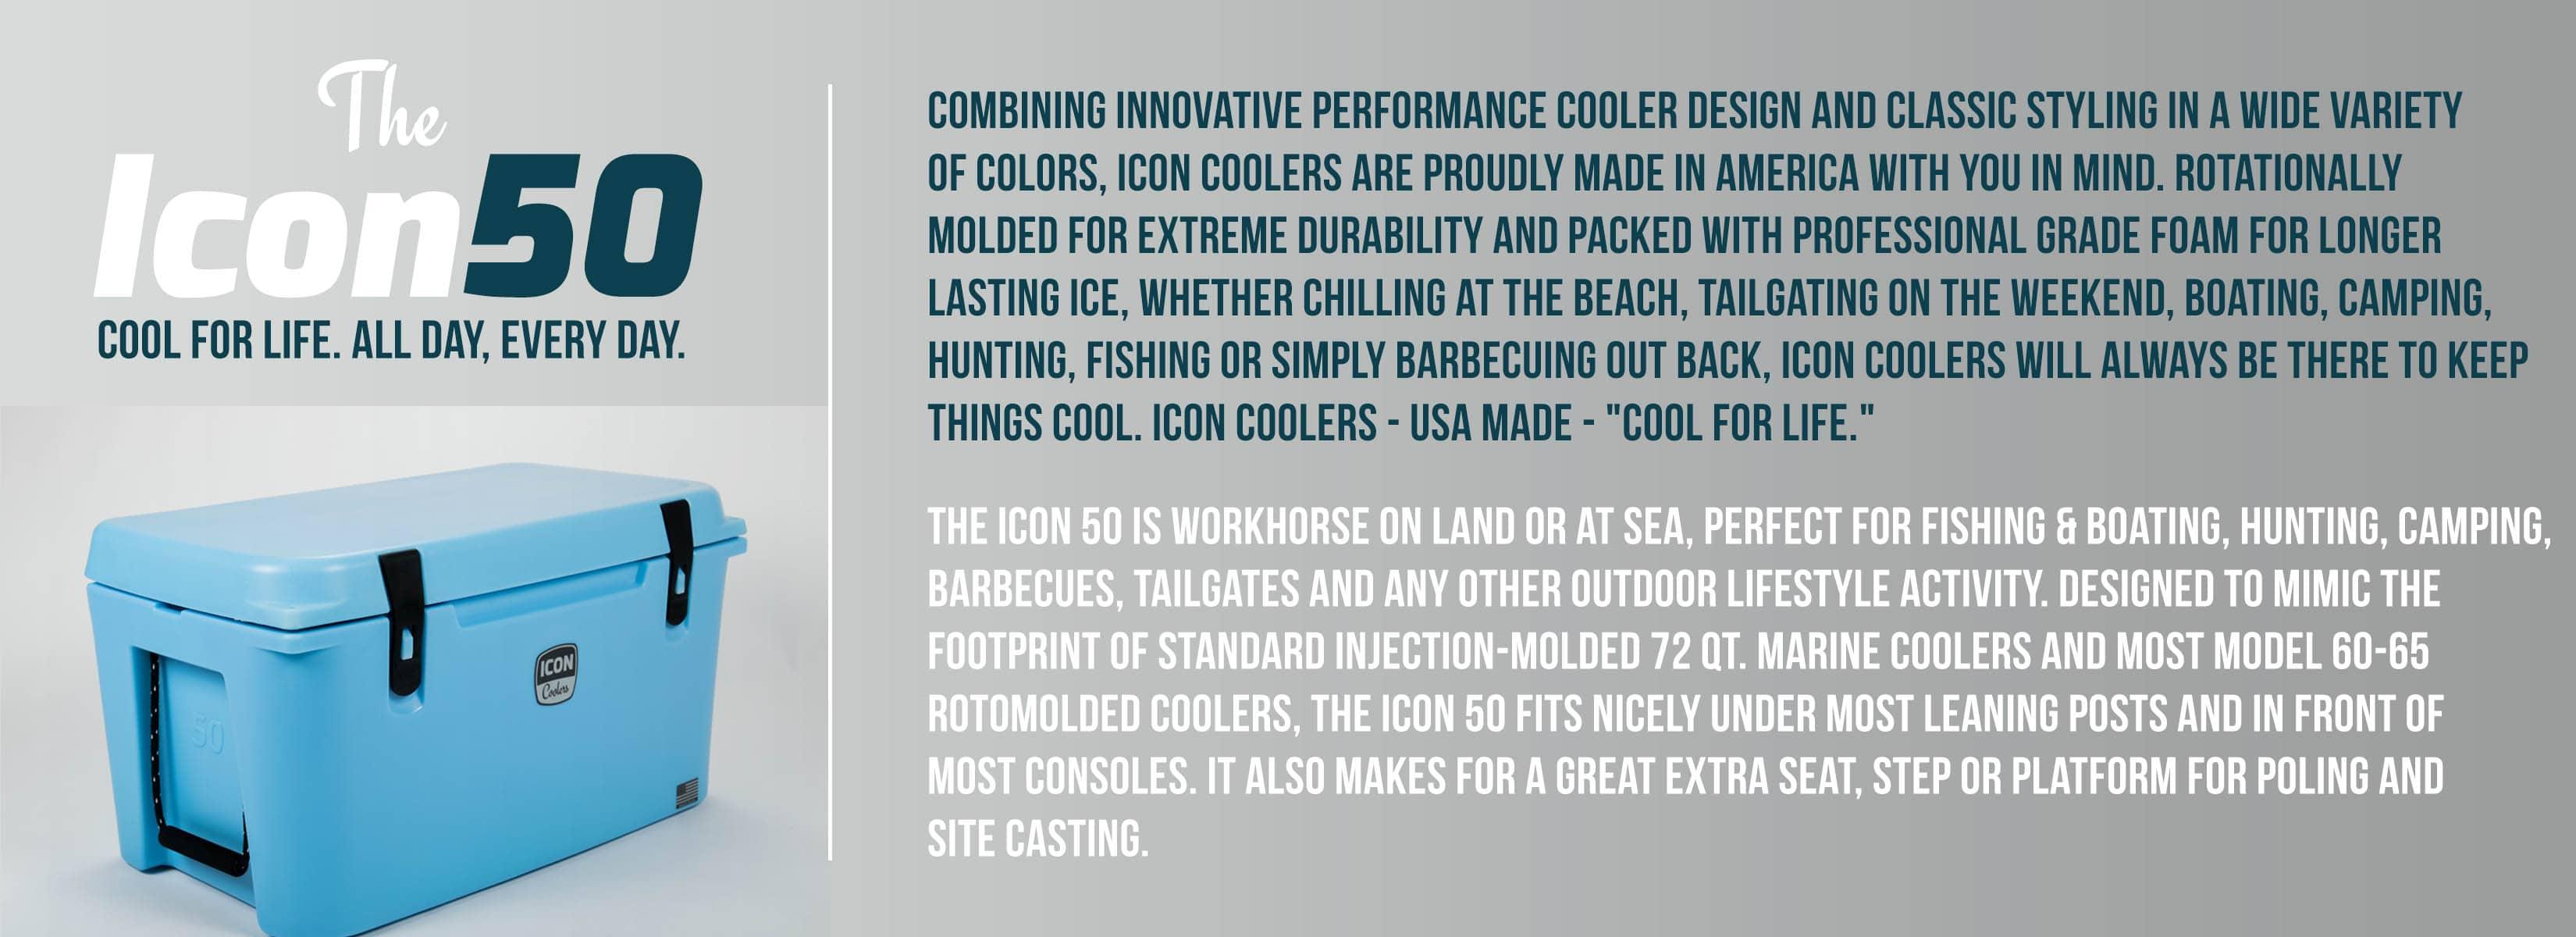 icon-hard-cooler-50-subcat-header-min.jpg